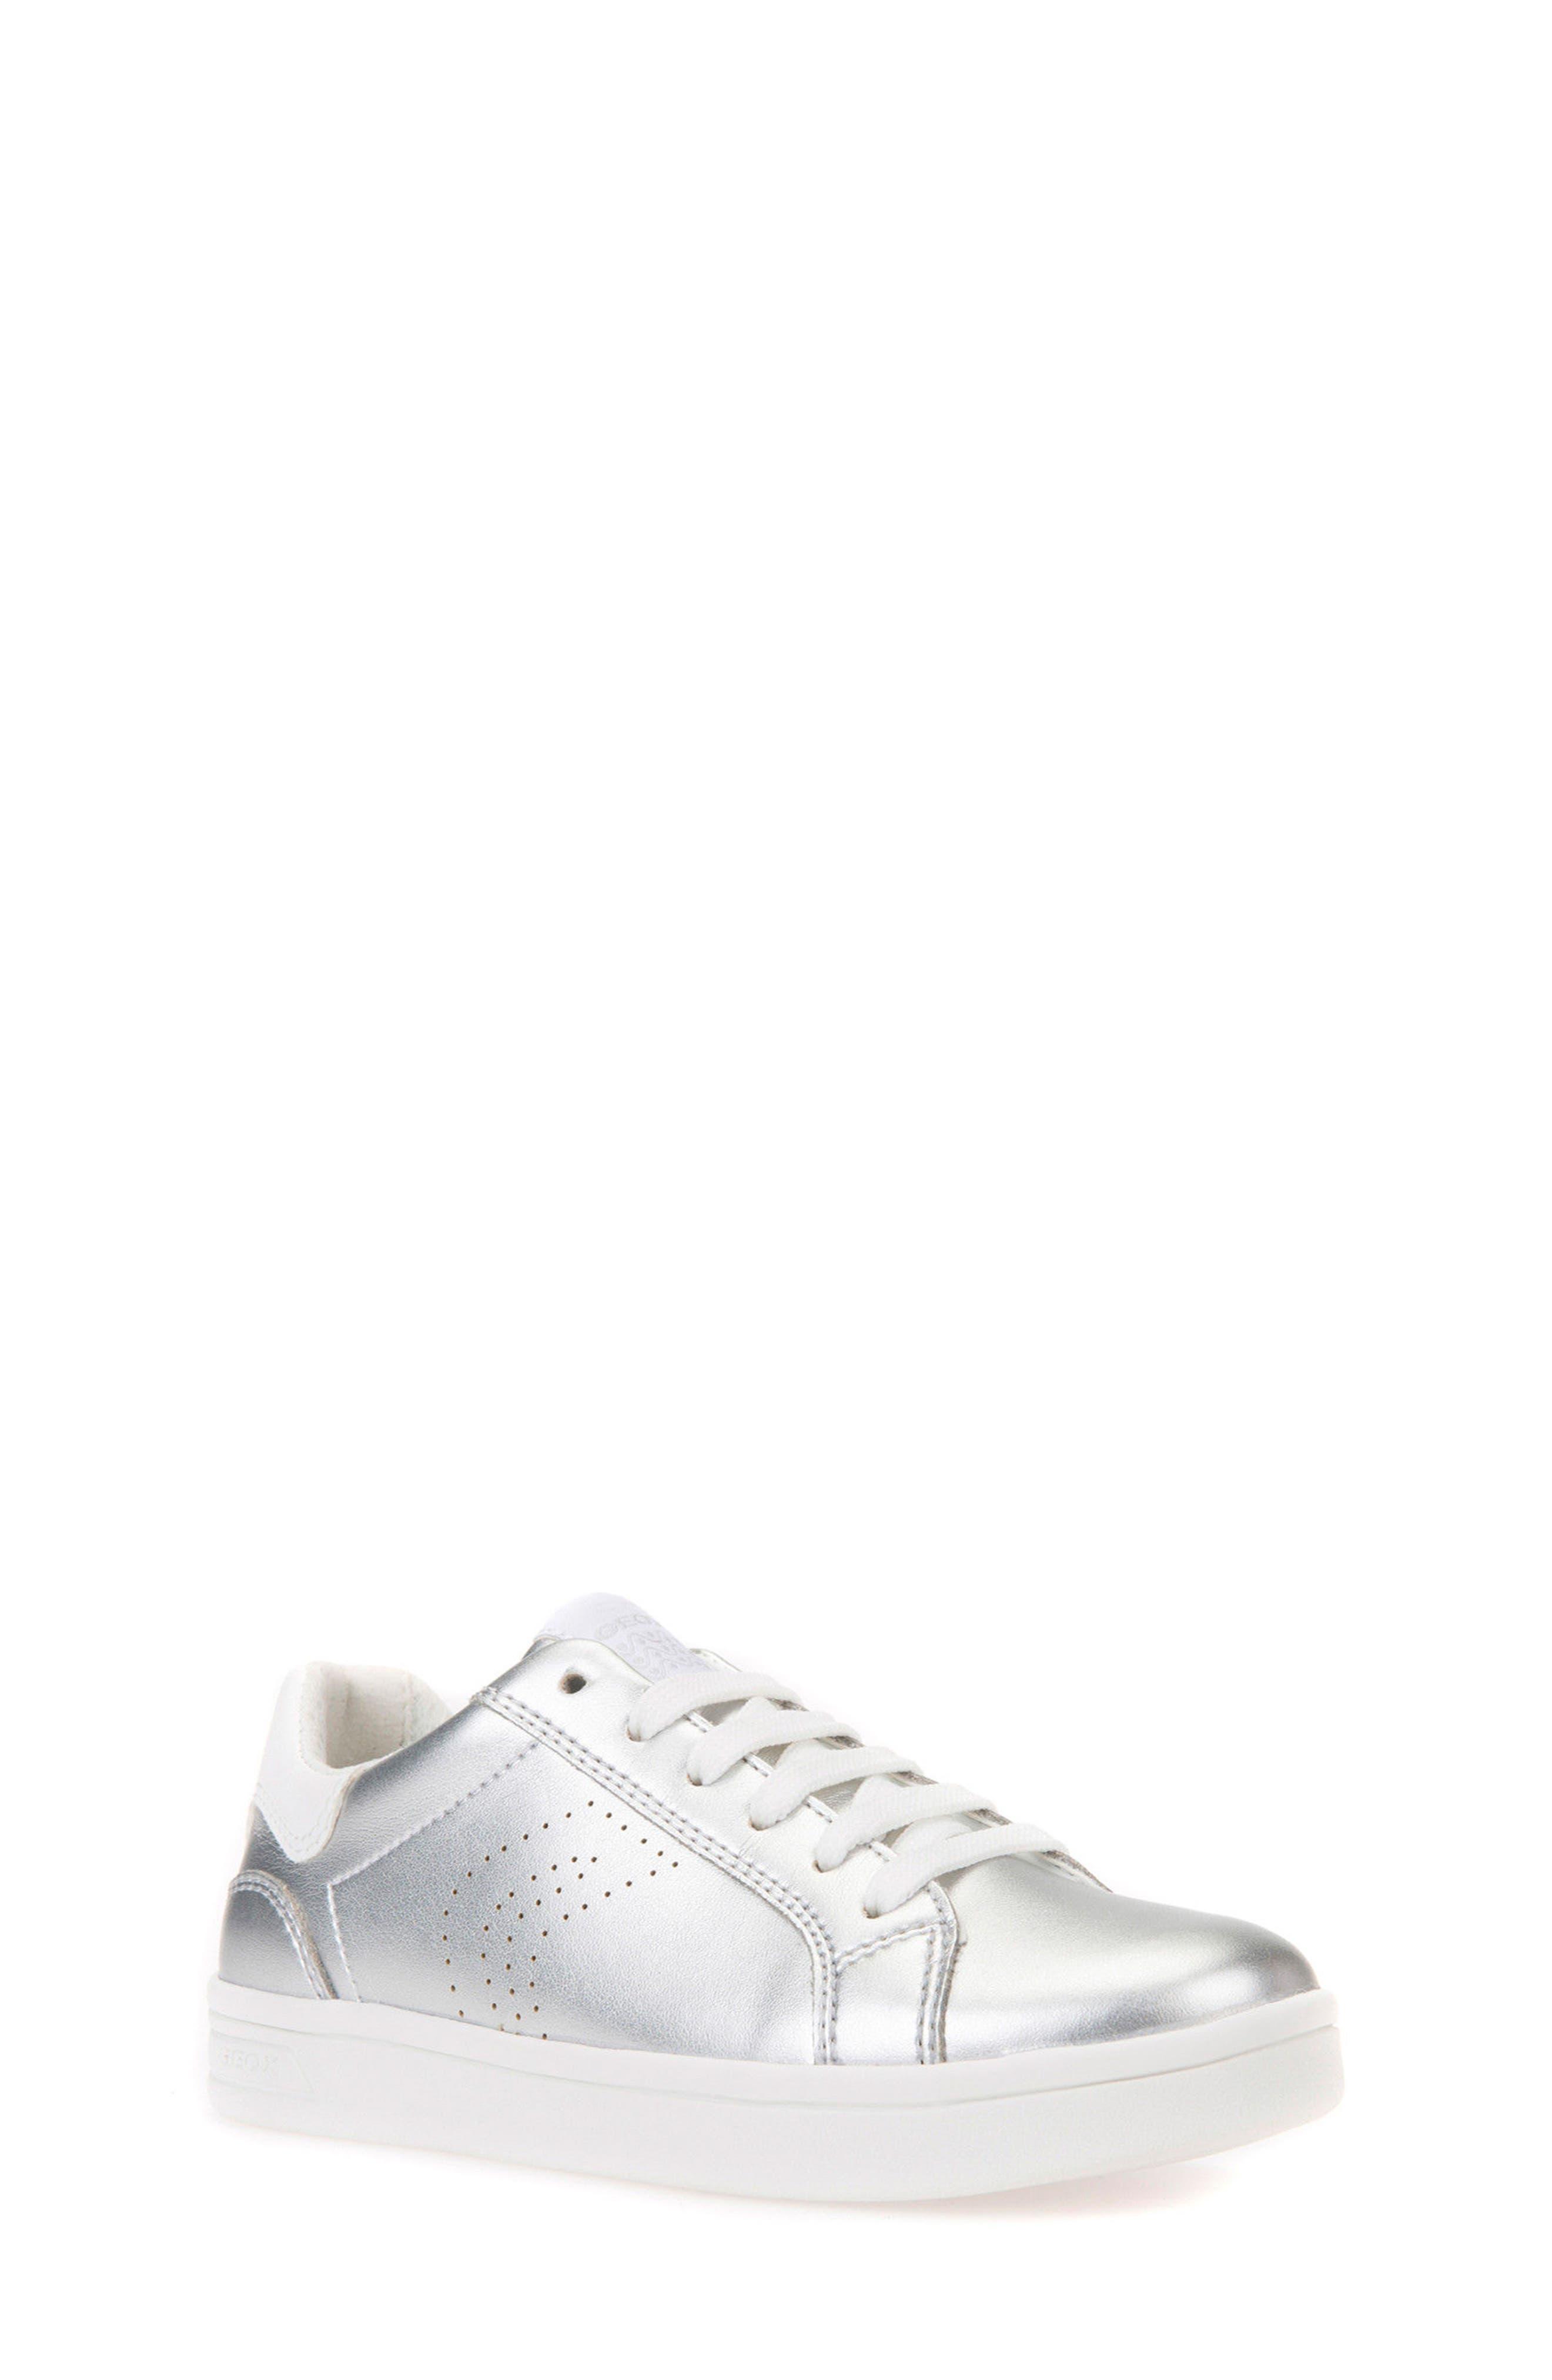 DJ Rock Metallic Low Top Sneaker,                             Main thumbnail 1, color,                             Silver